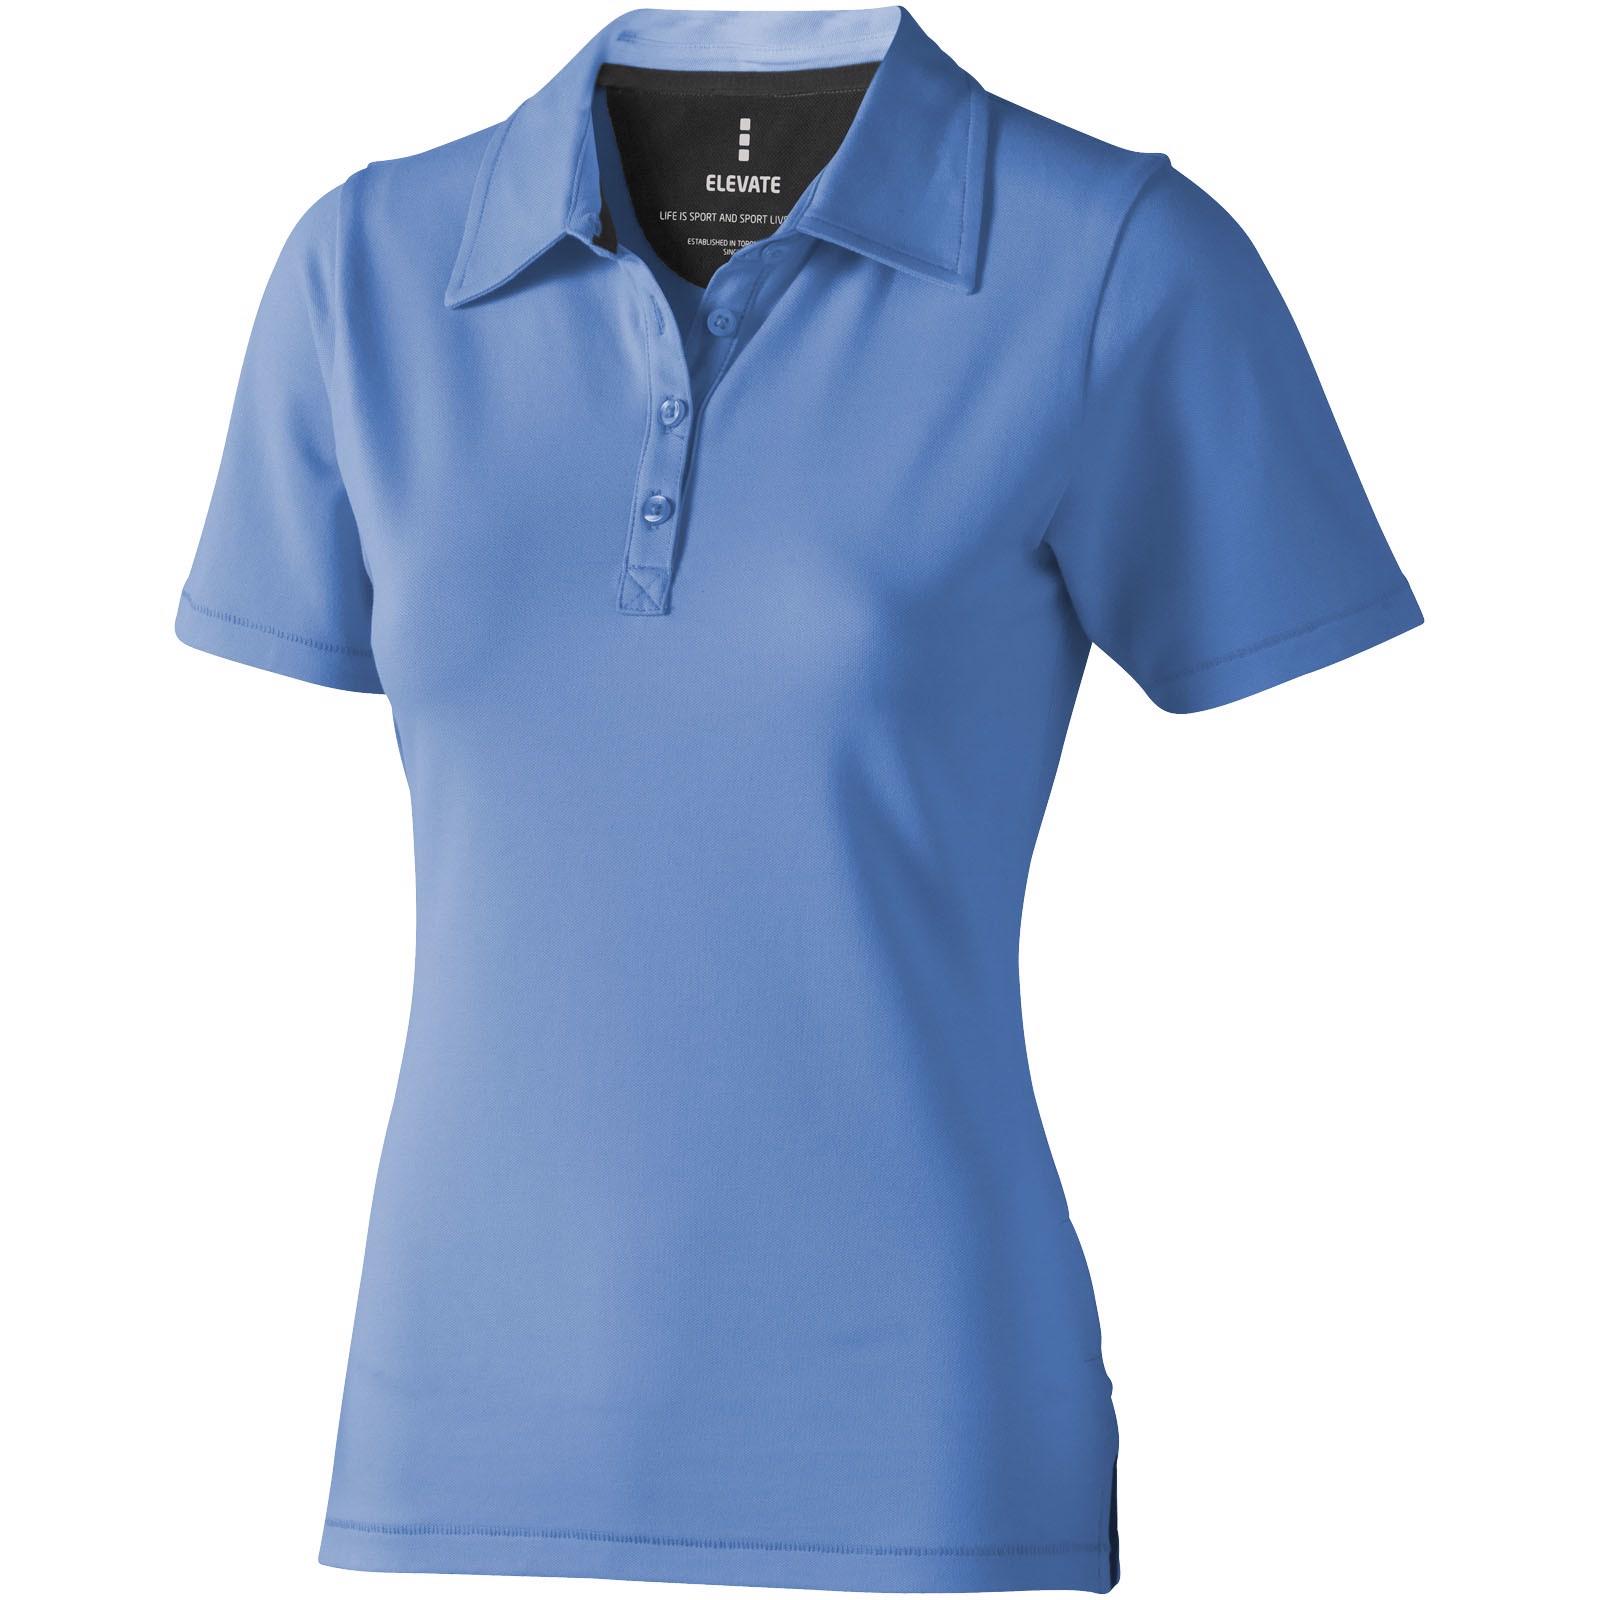 Markham short sleeve women's stretch polo - Light blue / XXL